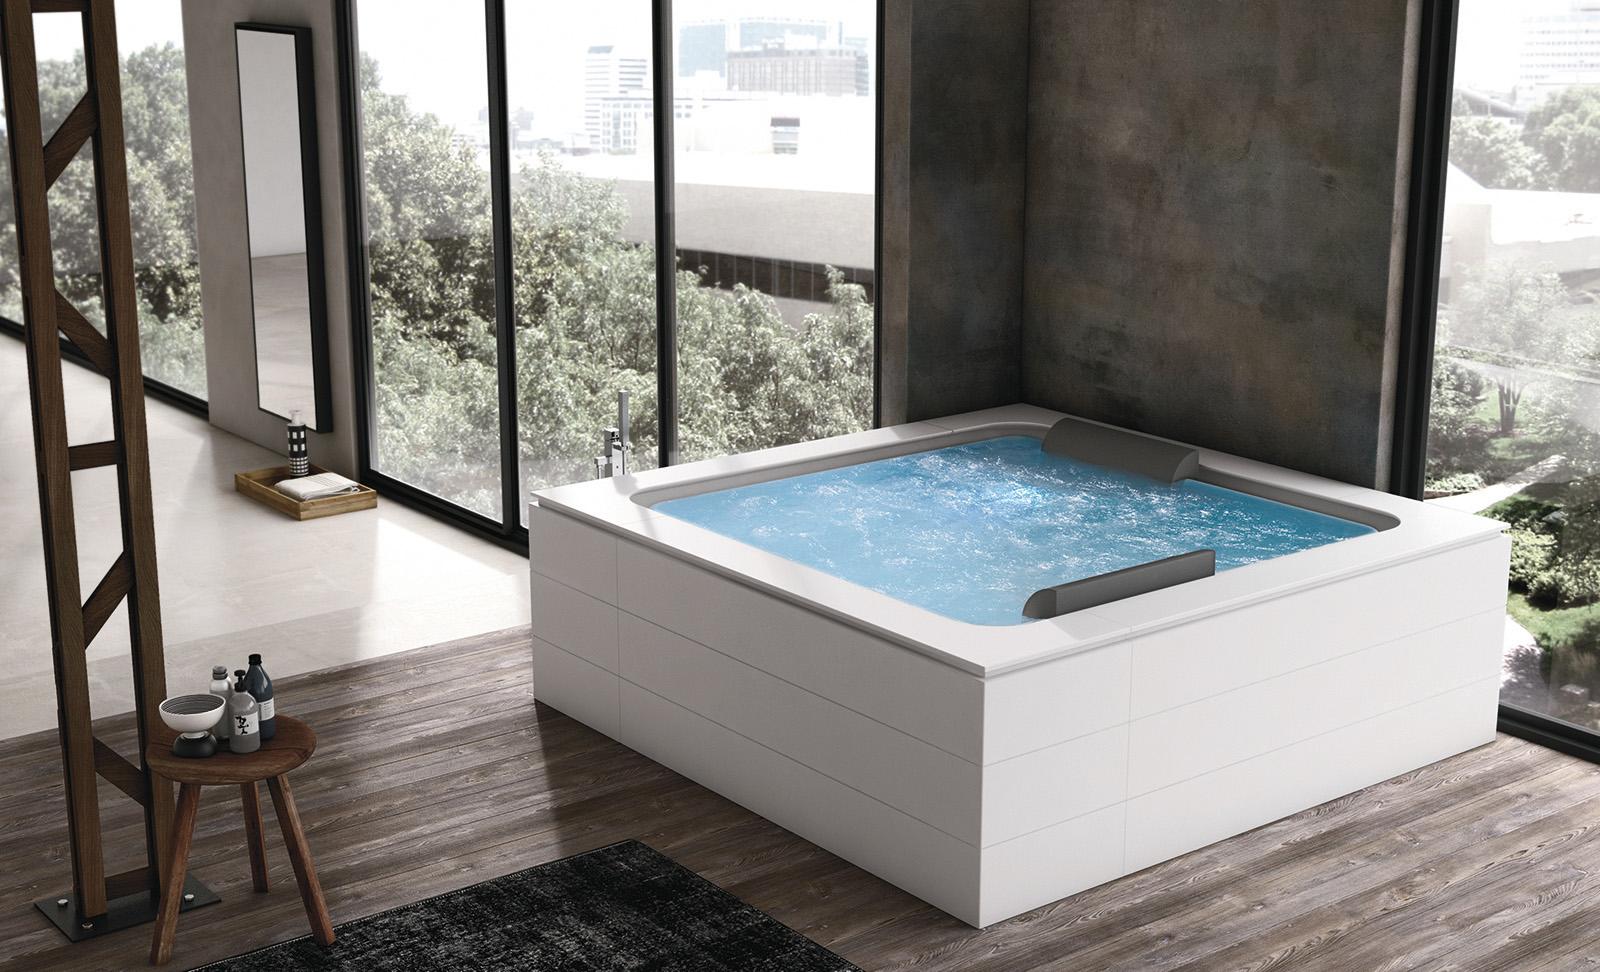 Vasche Idromassaggio Misure E Prezzi edilizia casa | vasche idromassaggio